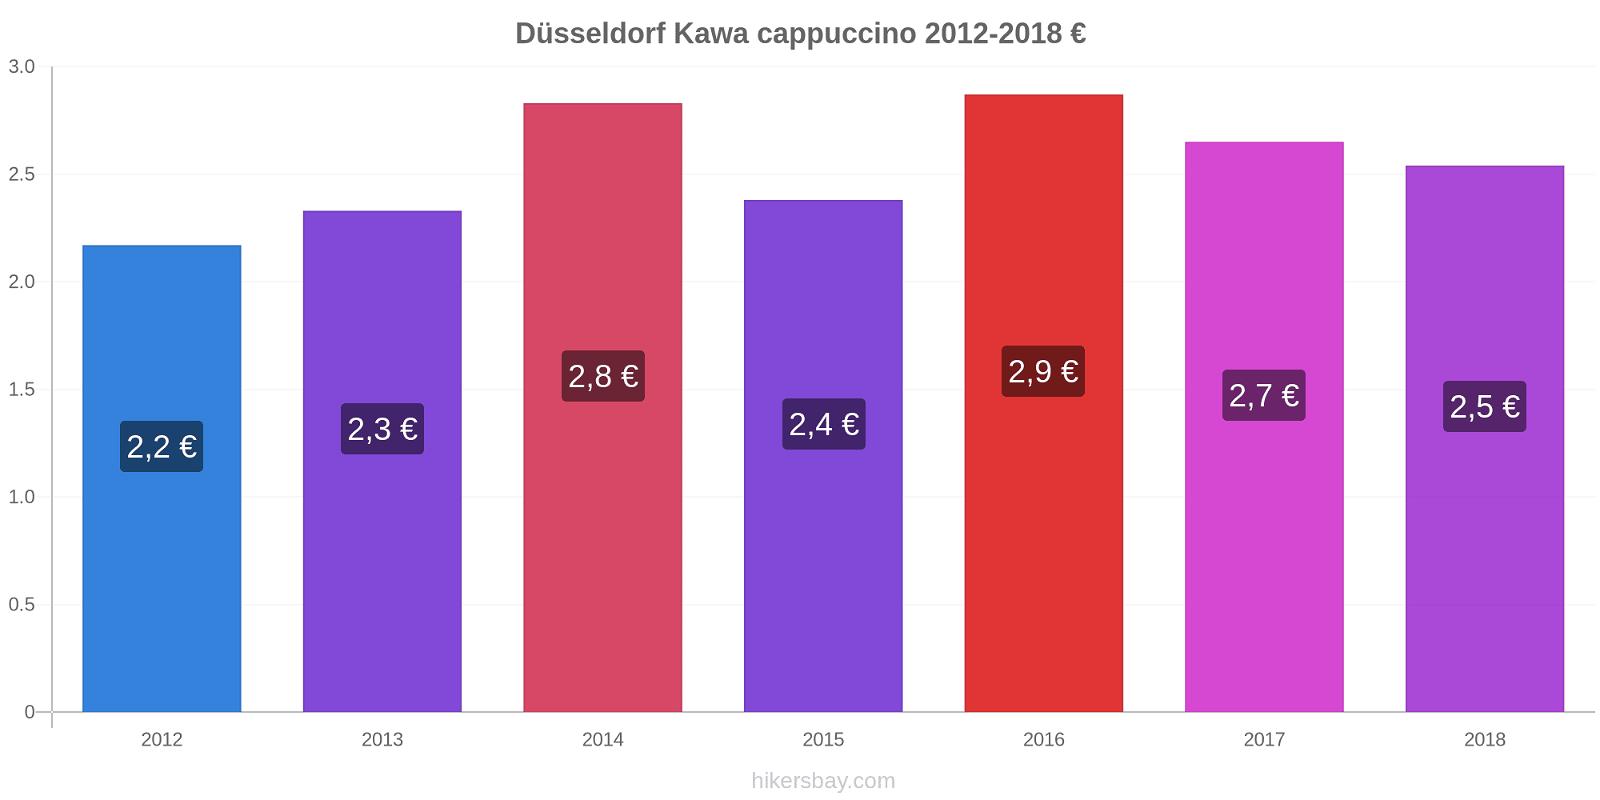 Düsseldorf zmiany cen Kawa cappuccino hikersbay.com